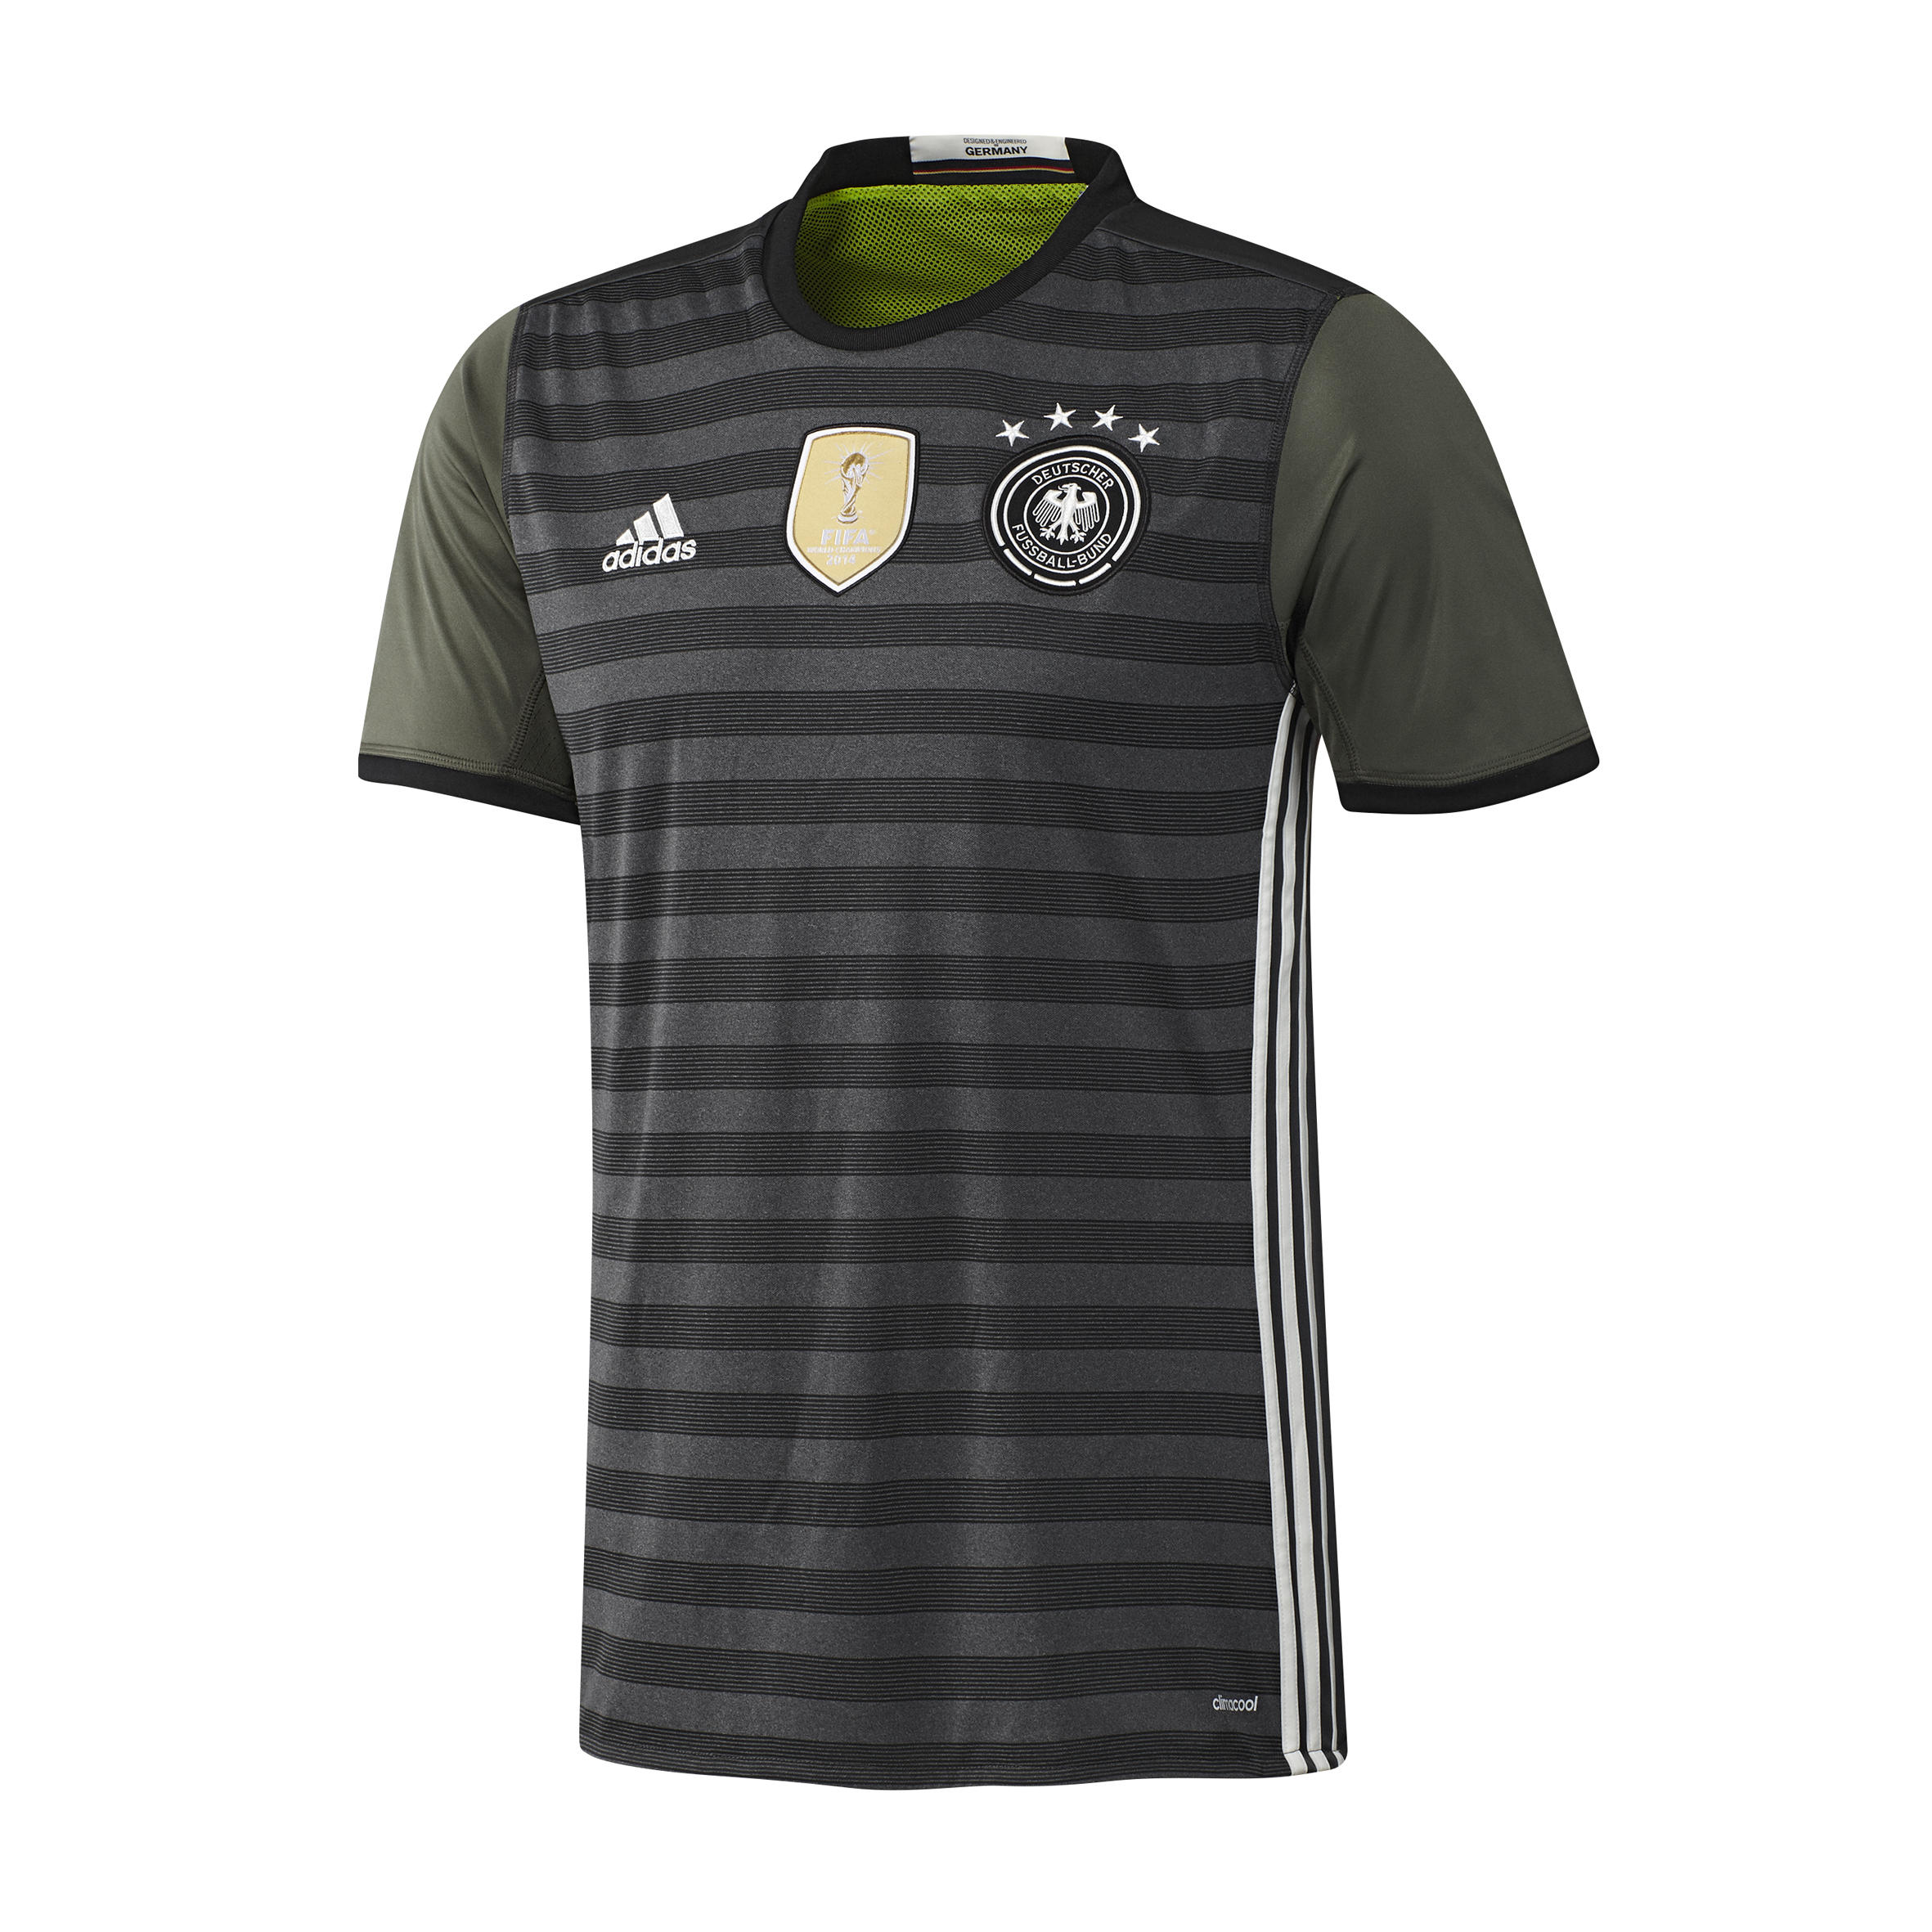 ADIDAS PERFORMANCE Shirt DFB AWAY JERSEY YOUTH